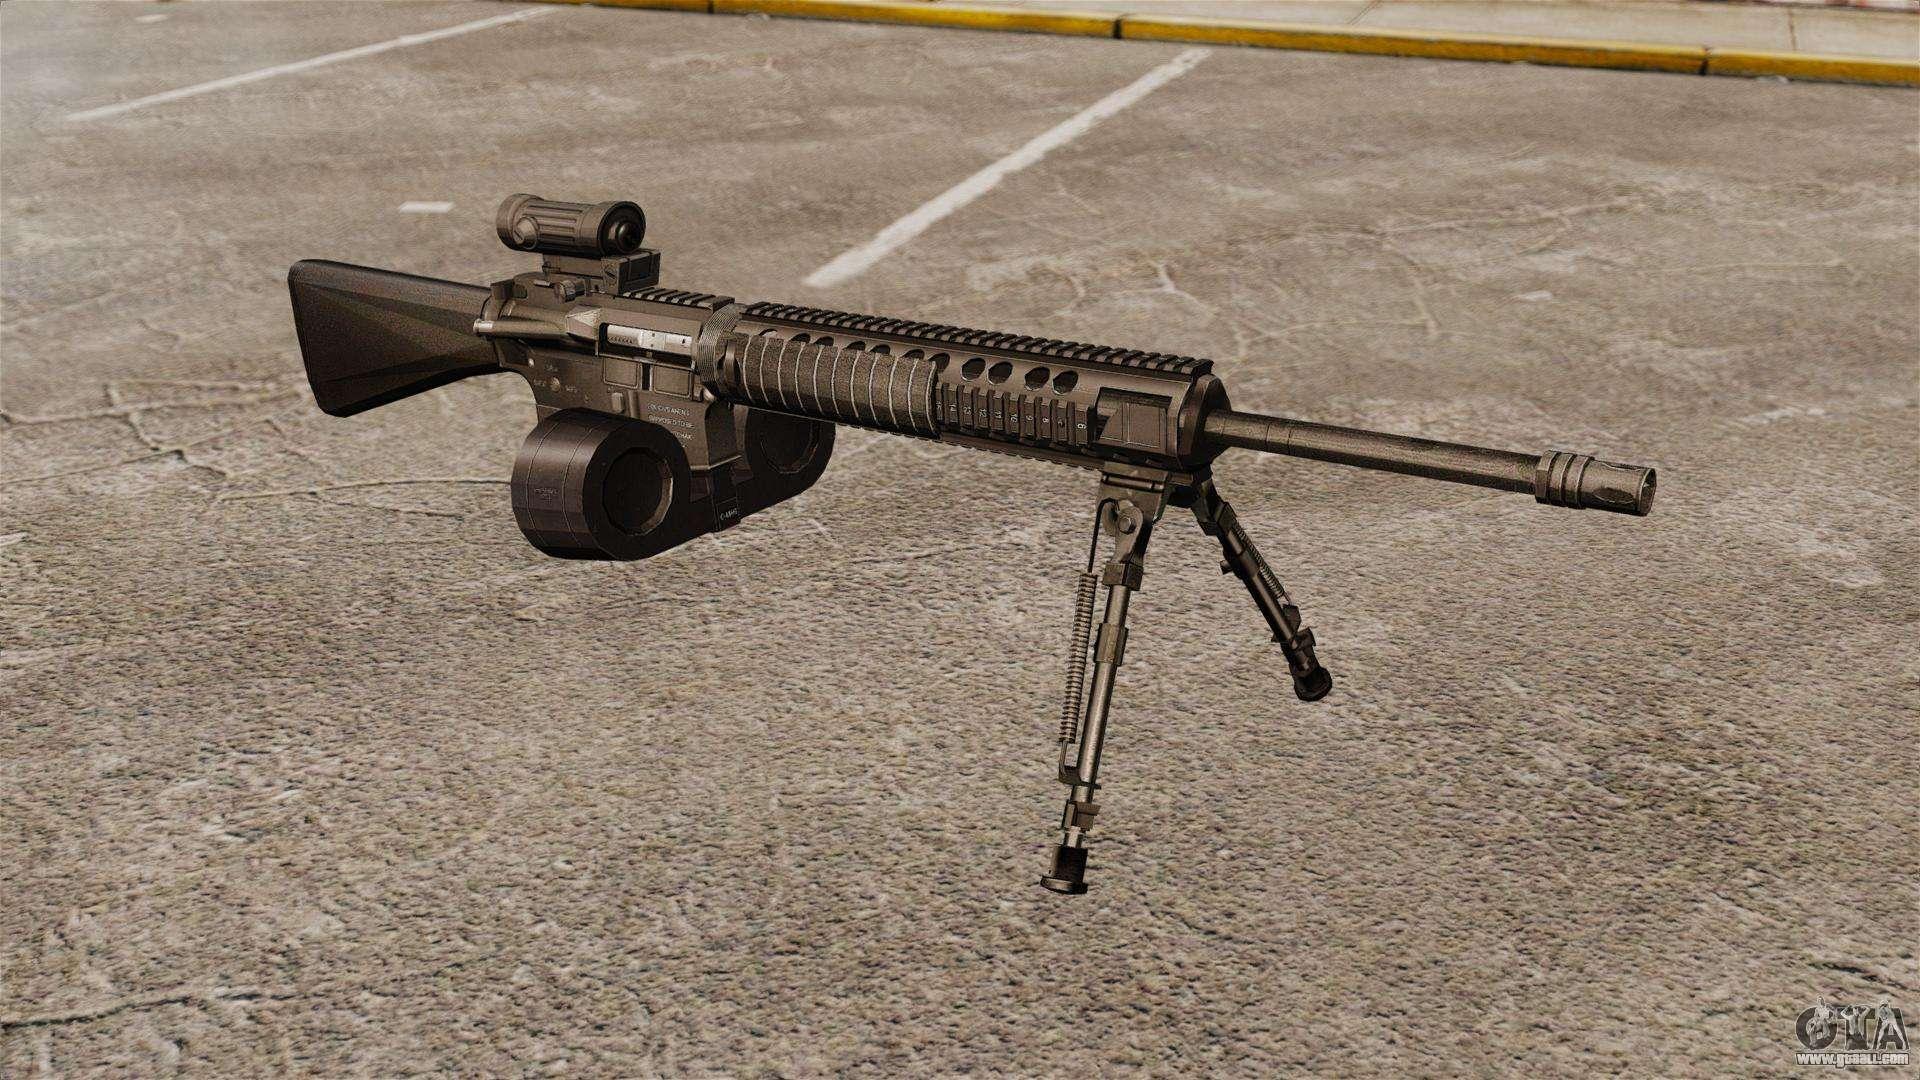 Assault rifle M16A4 C-MAG Scope for GTA 4 M16a4 Assault Rifle